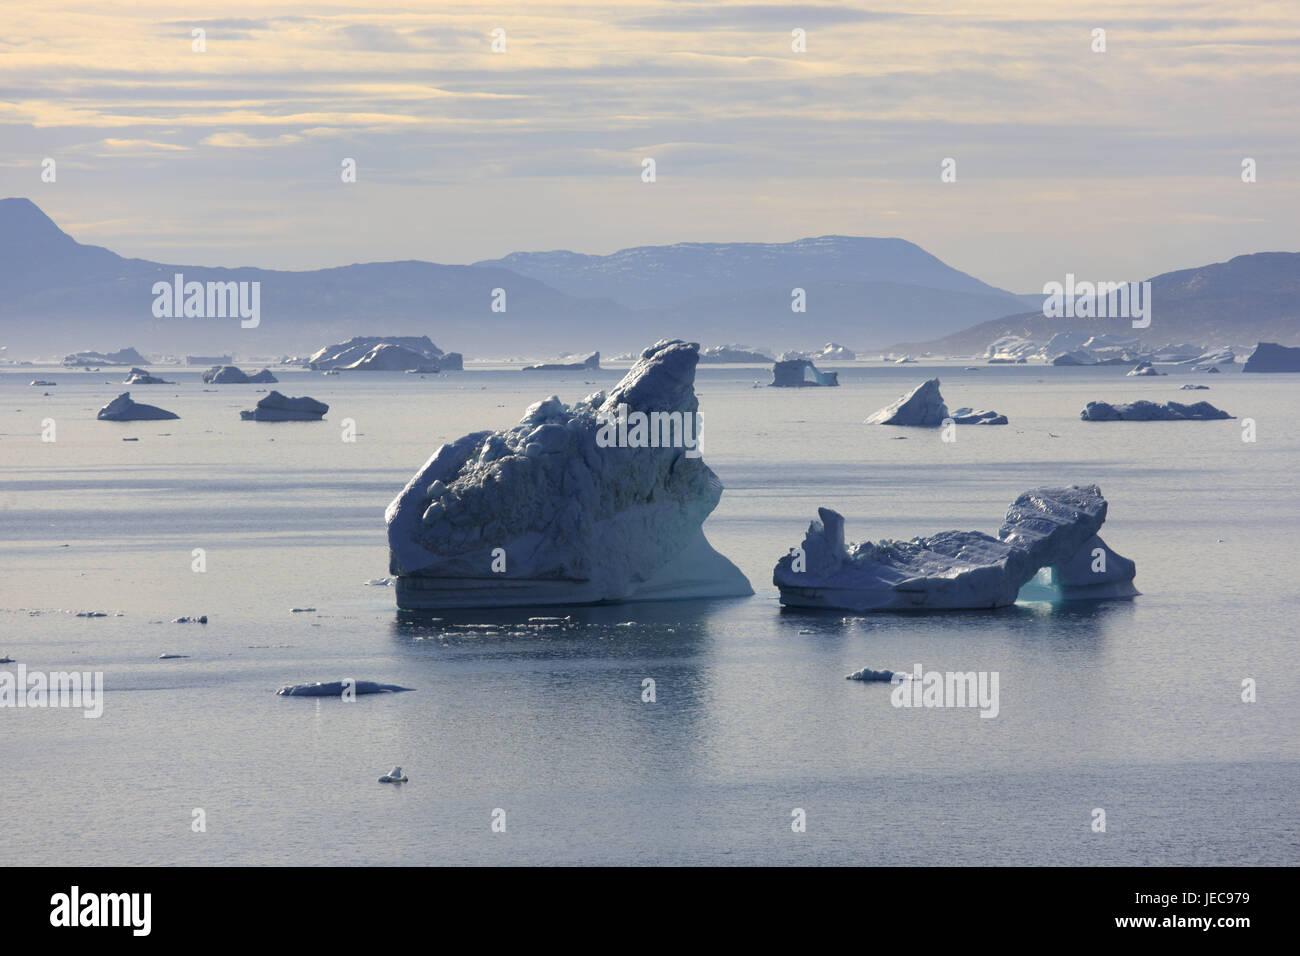 Greenland, Uummannaq, fjord, icebergs, Northern Greenland, destination, scenery, sea, the Arctic, ice, glacier ice, - Stock Image